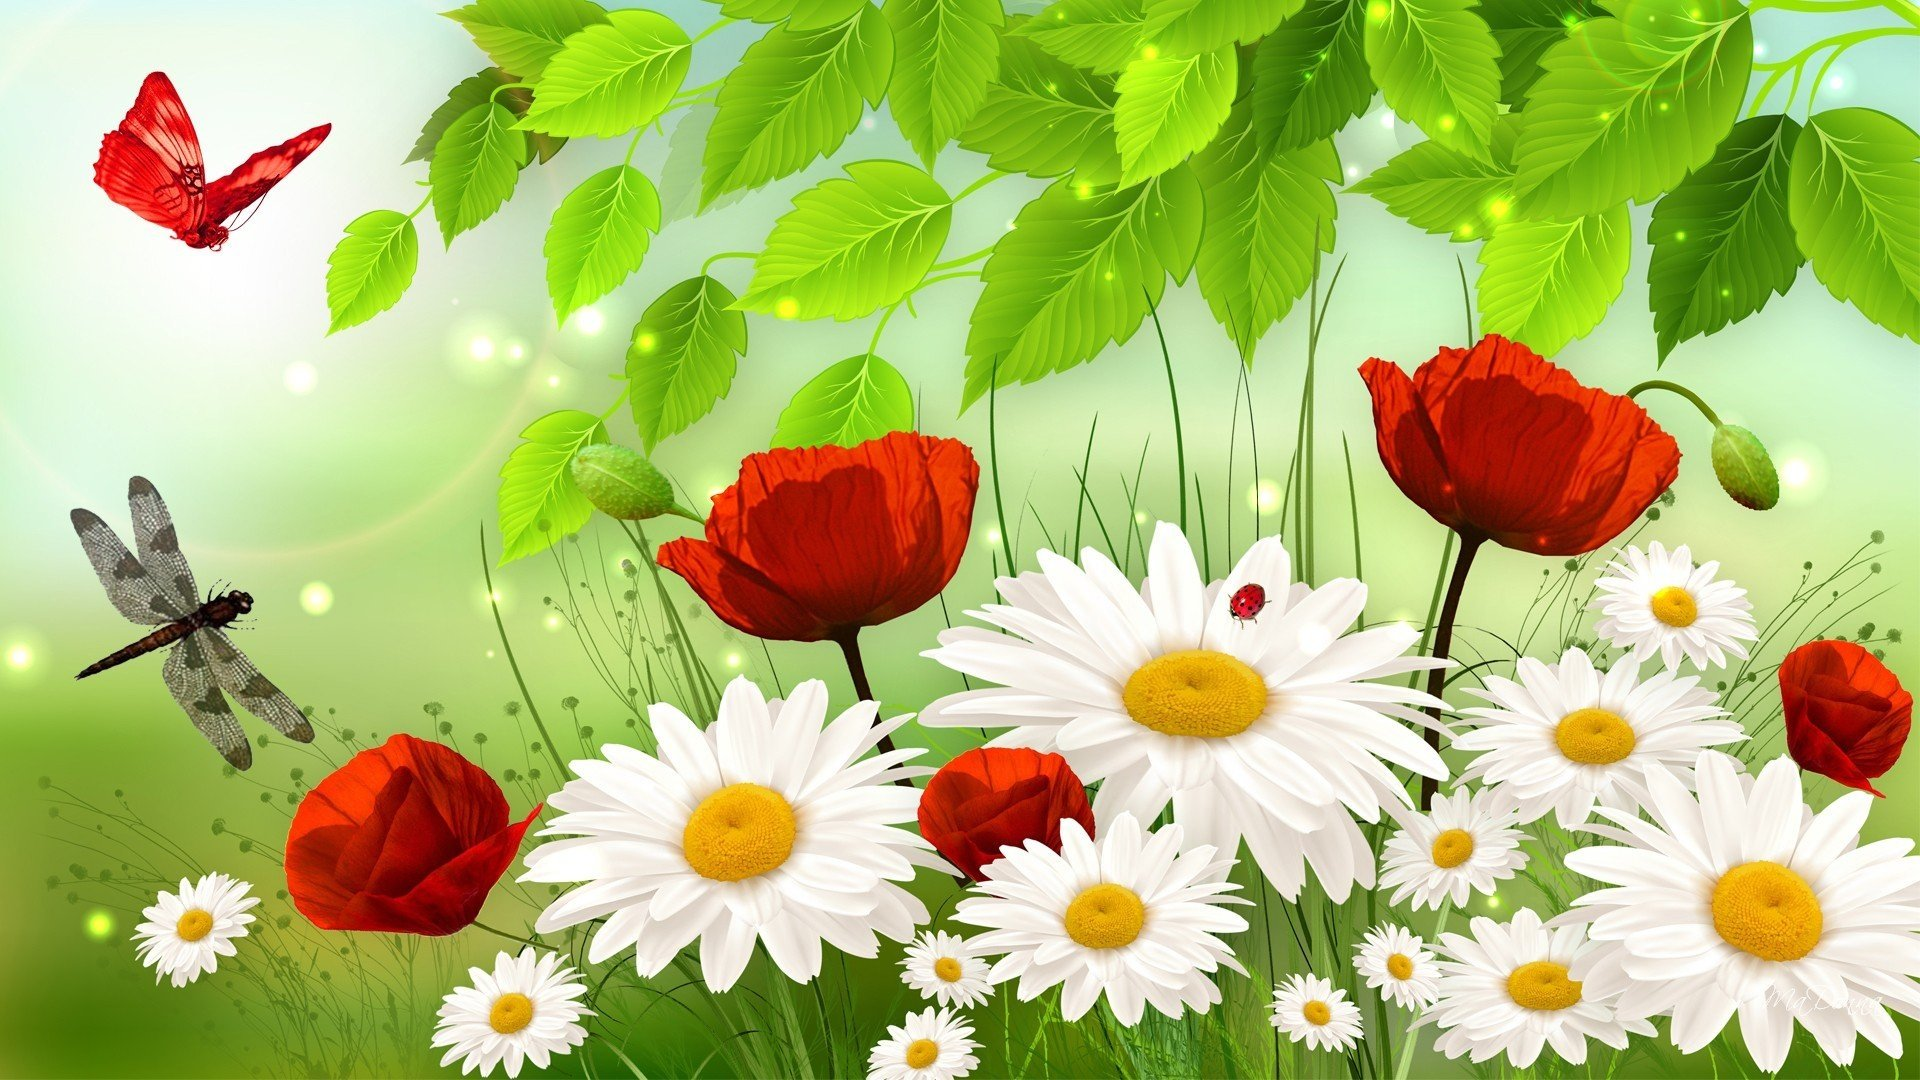 Springtime full hd fond d 39 cran and arri re plan for Fond ecran ete fleurs